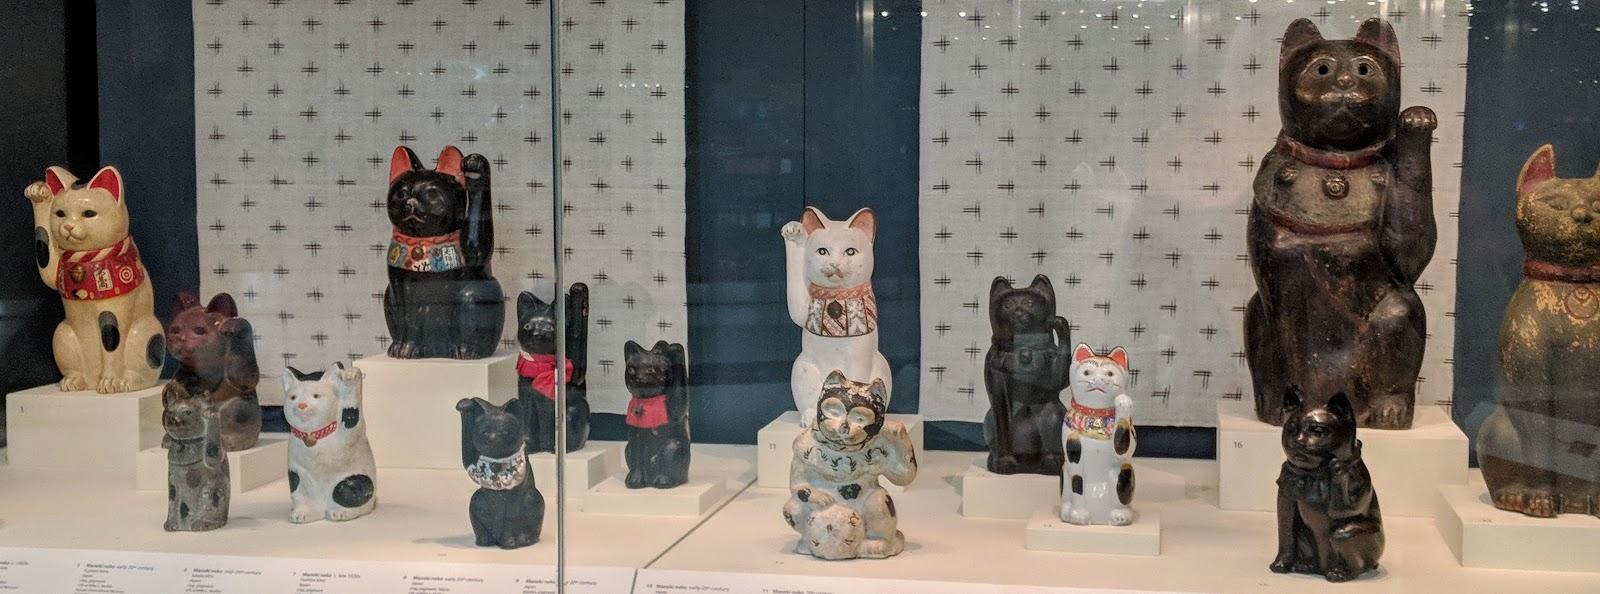 meneki neko the beckoning cats of japan at the san francisco airport museum